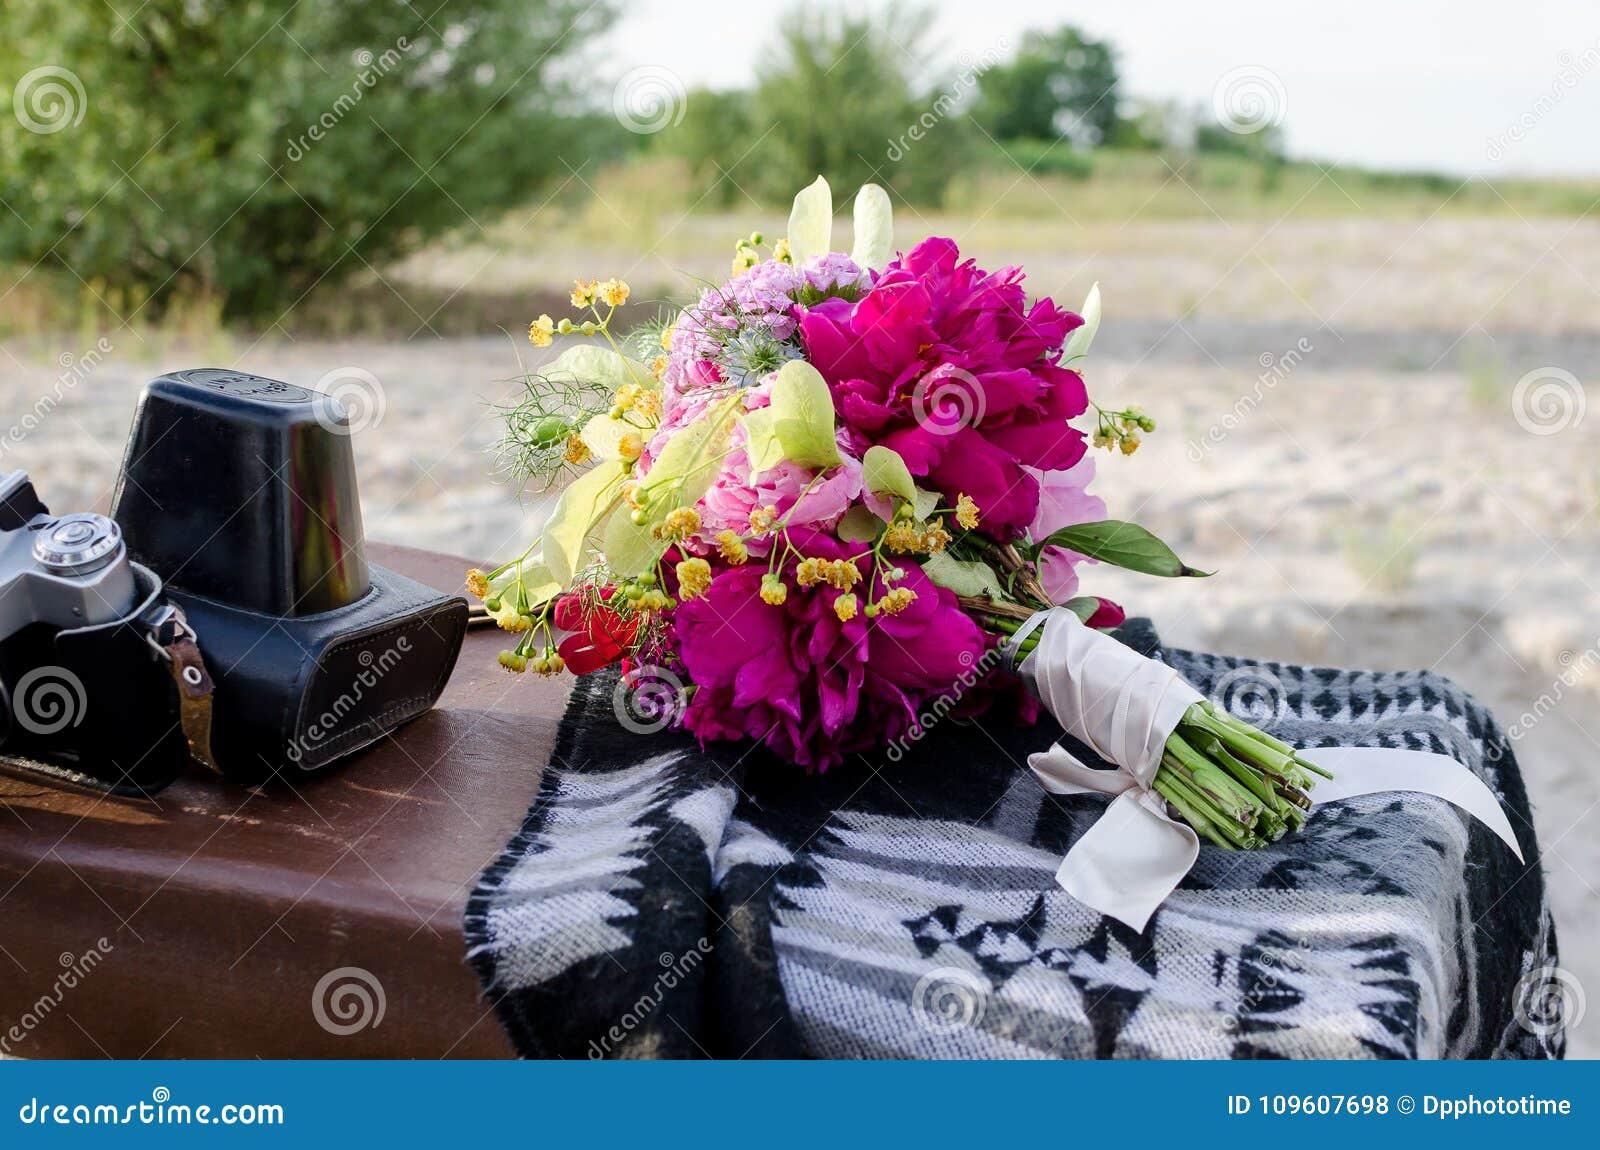 Wedding Boho Bouquet With Pink Magenta And Yellow Flowers Stock Photo Image Of Beauty Boho 109607698